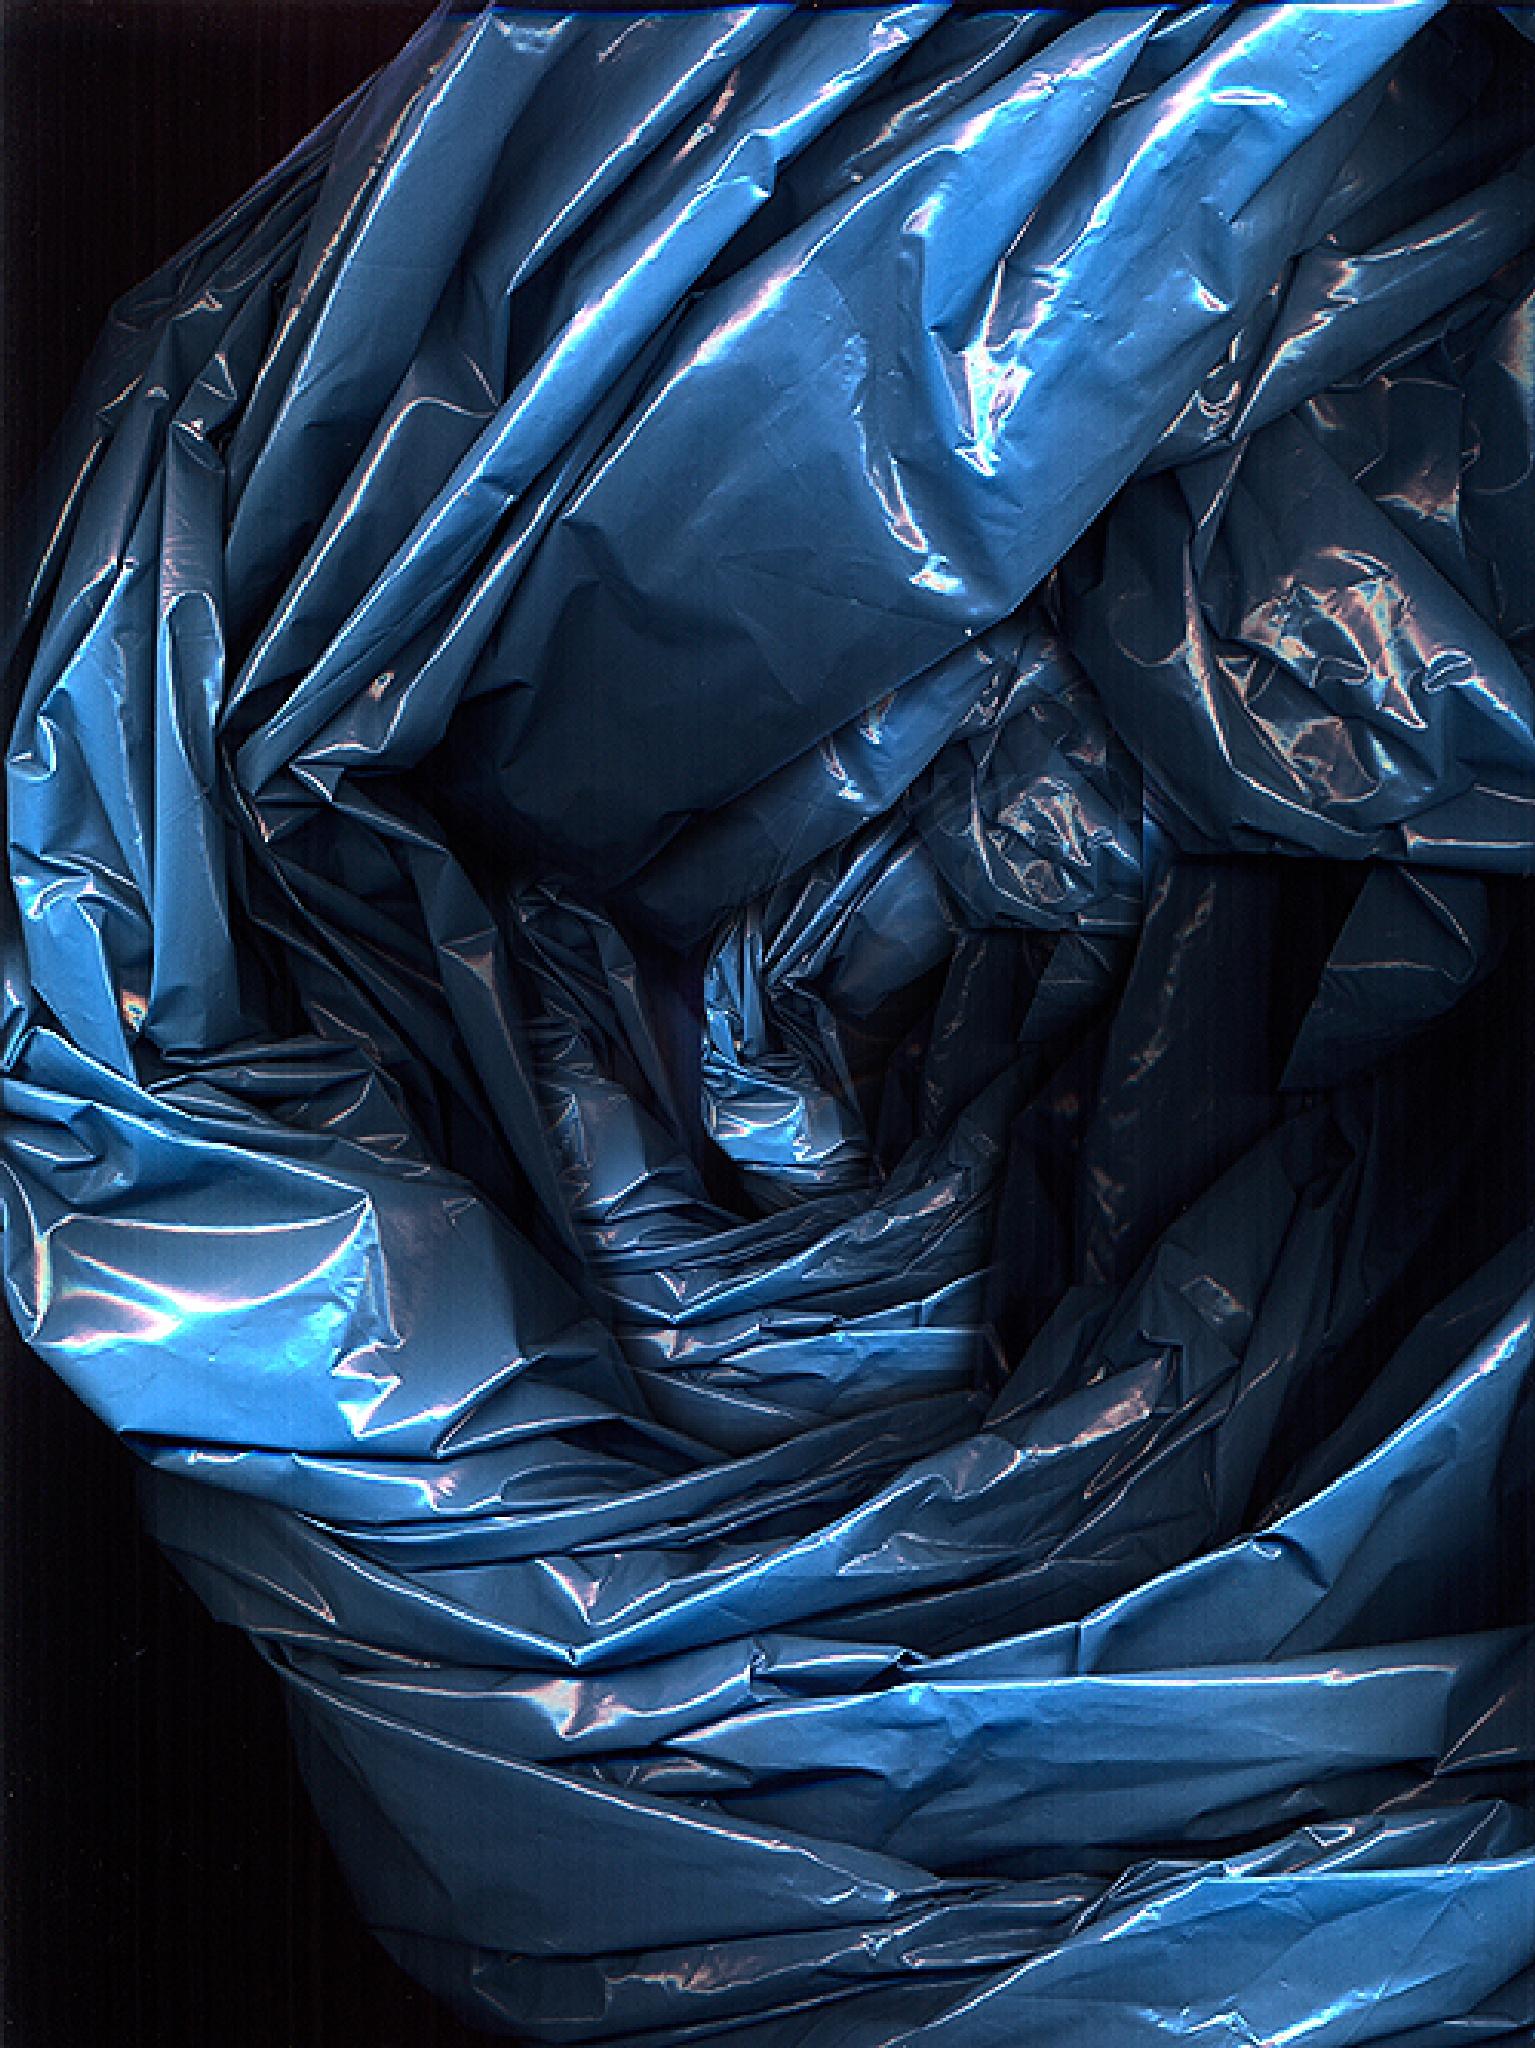 Blue plastic bag by Gernot Schwarz